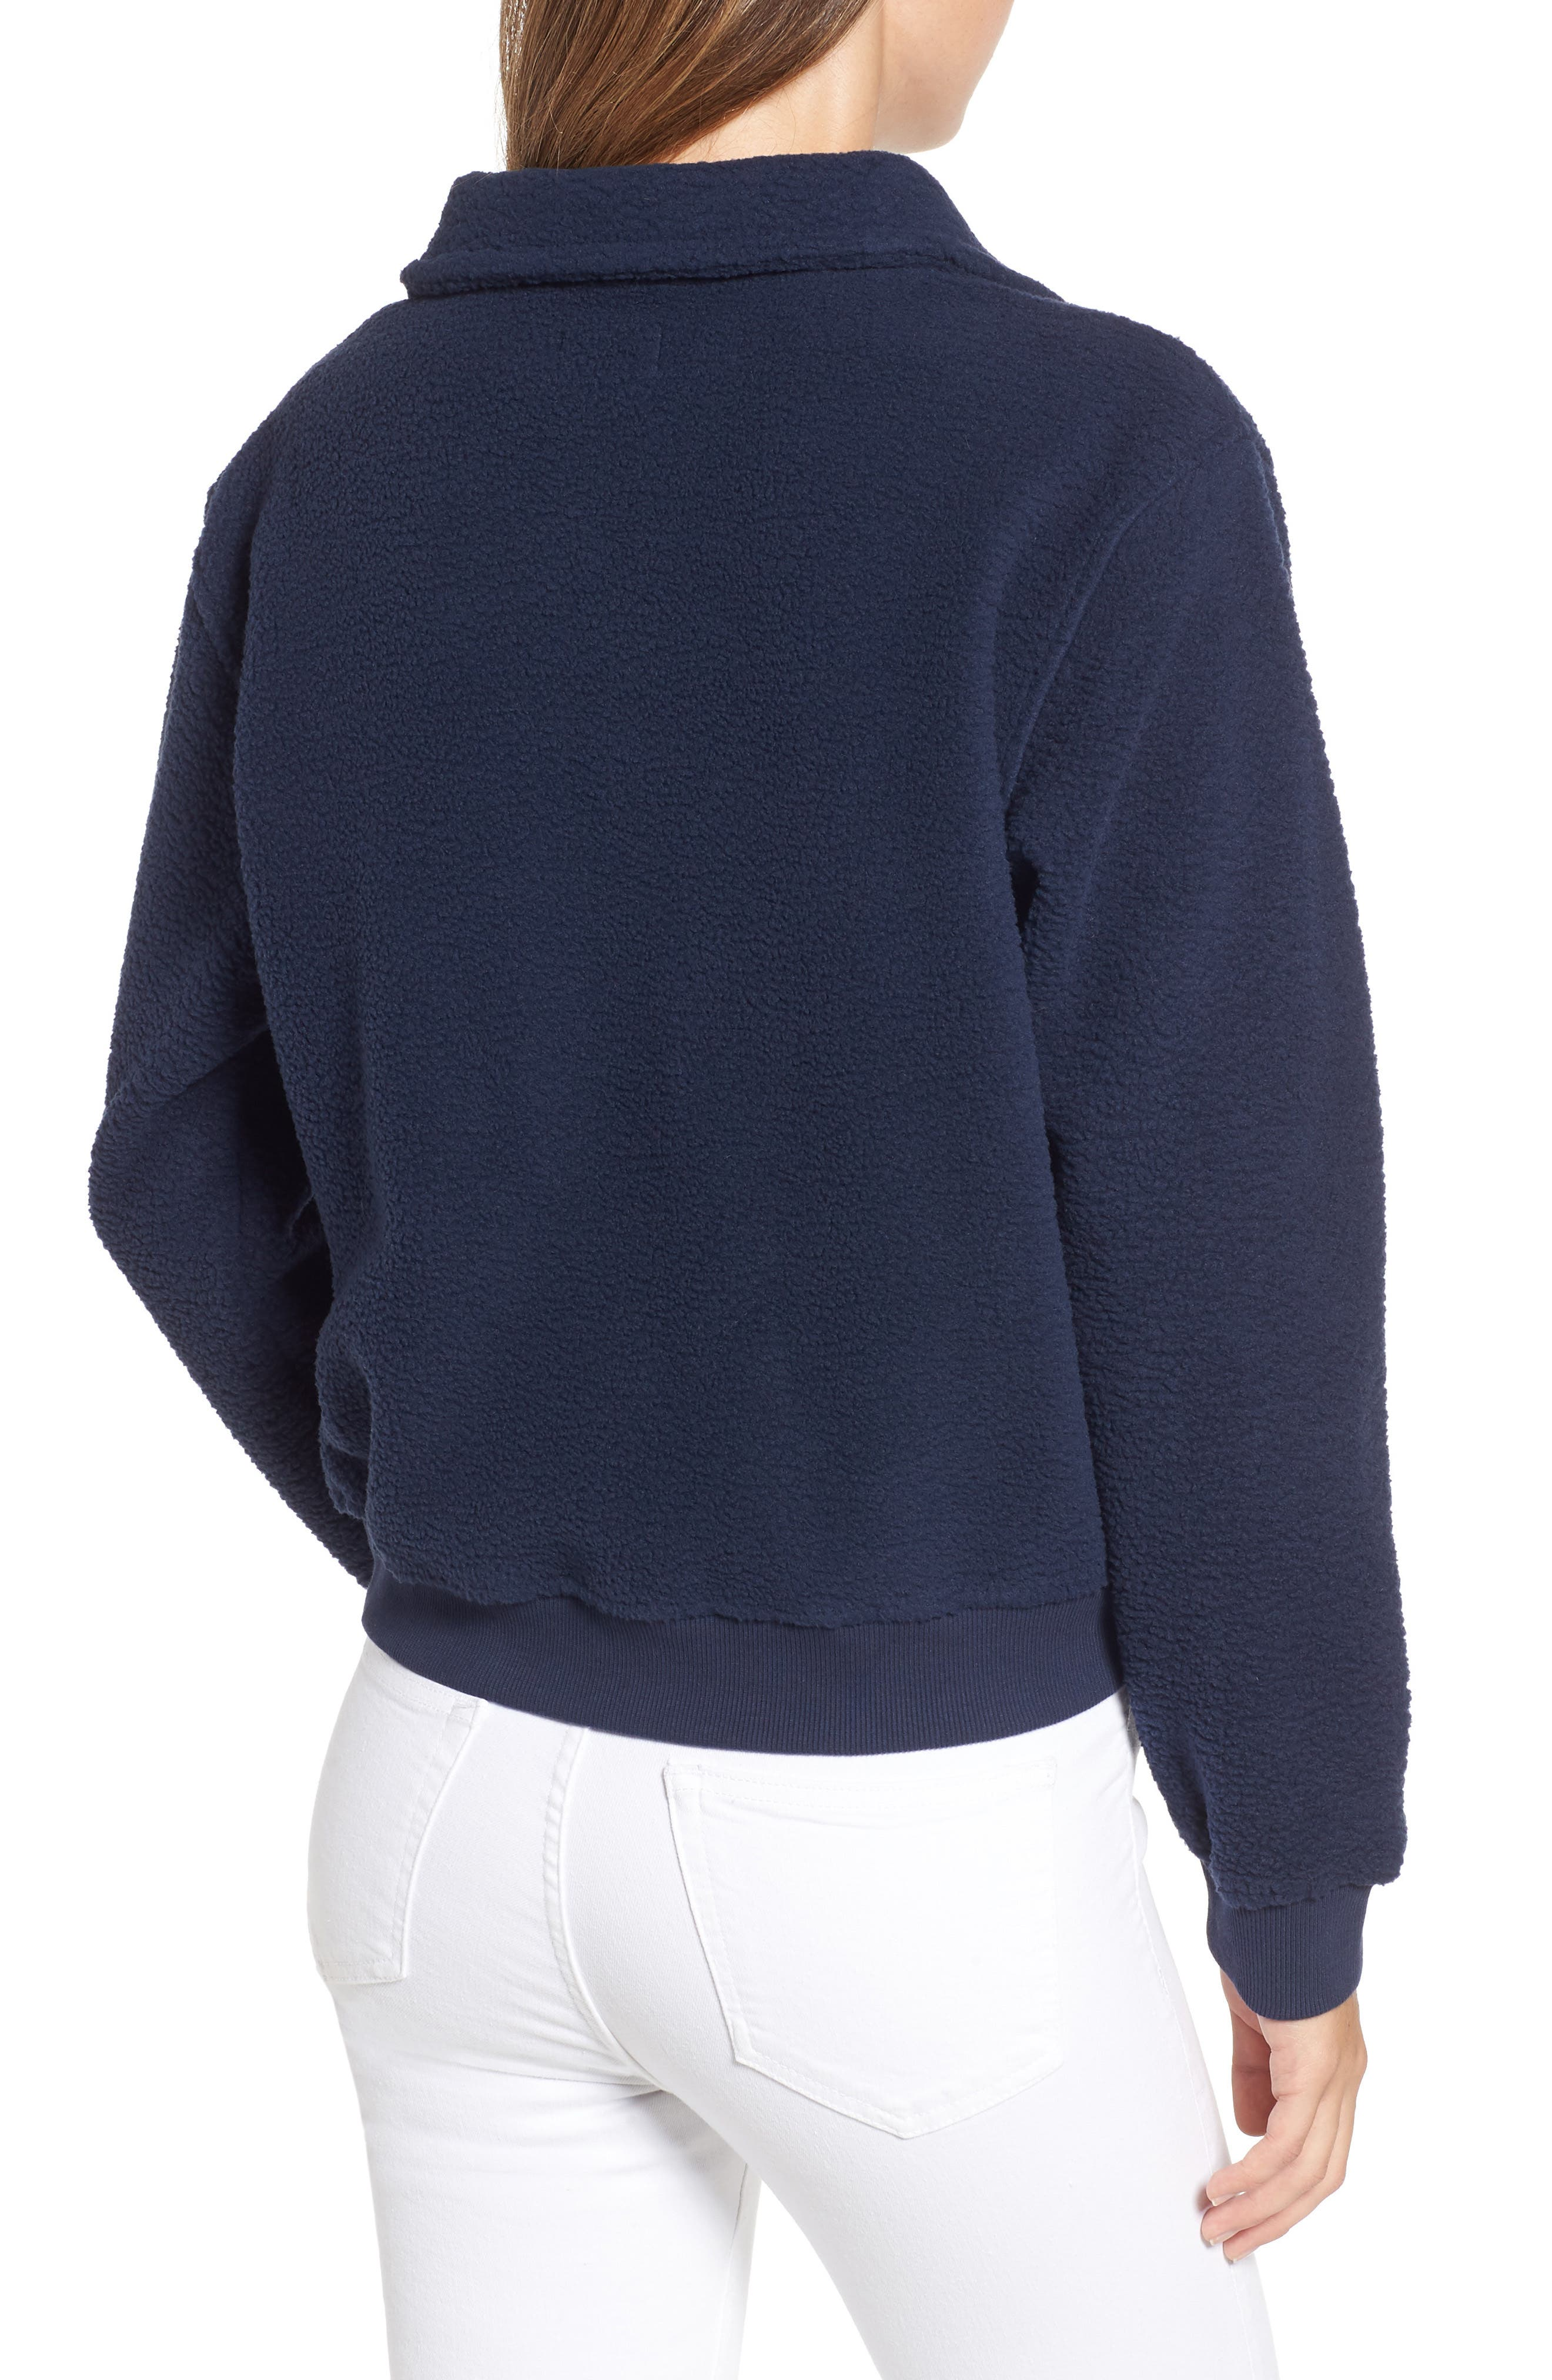 TJW Classics Polar Fleece Sweatshirt,                             Alternate thumbnail 2, color,                             002